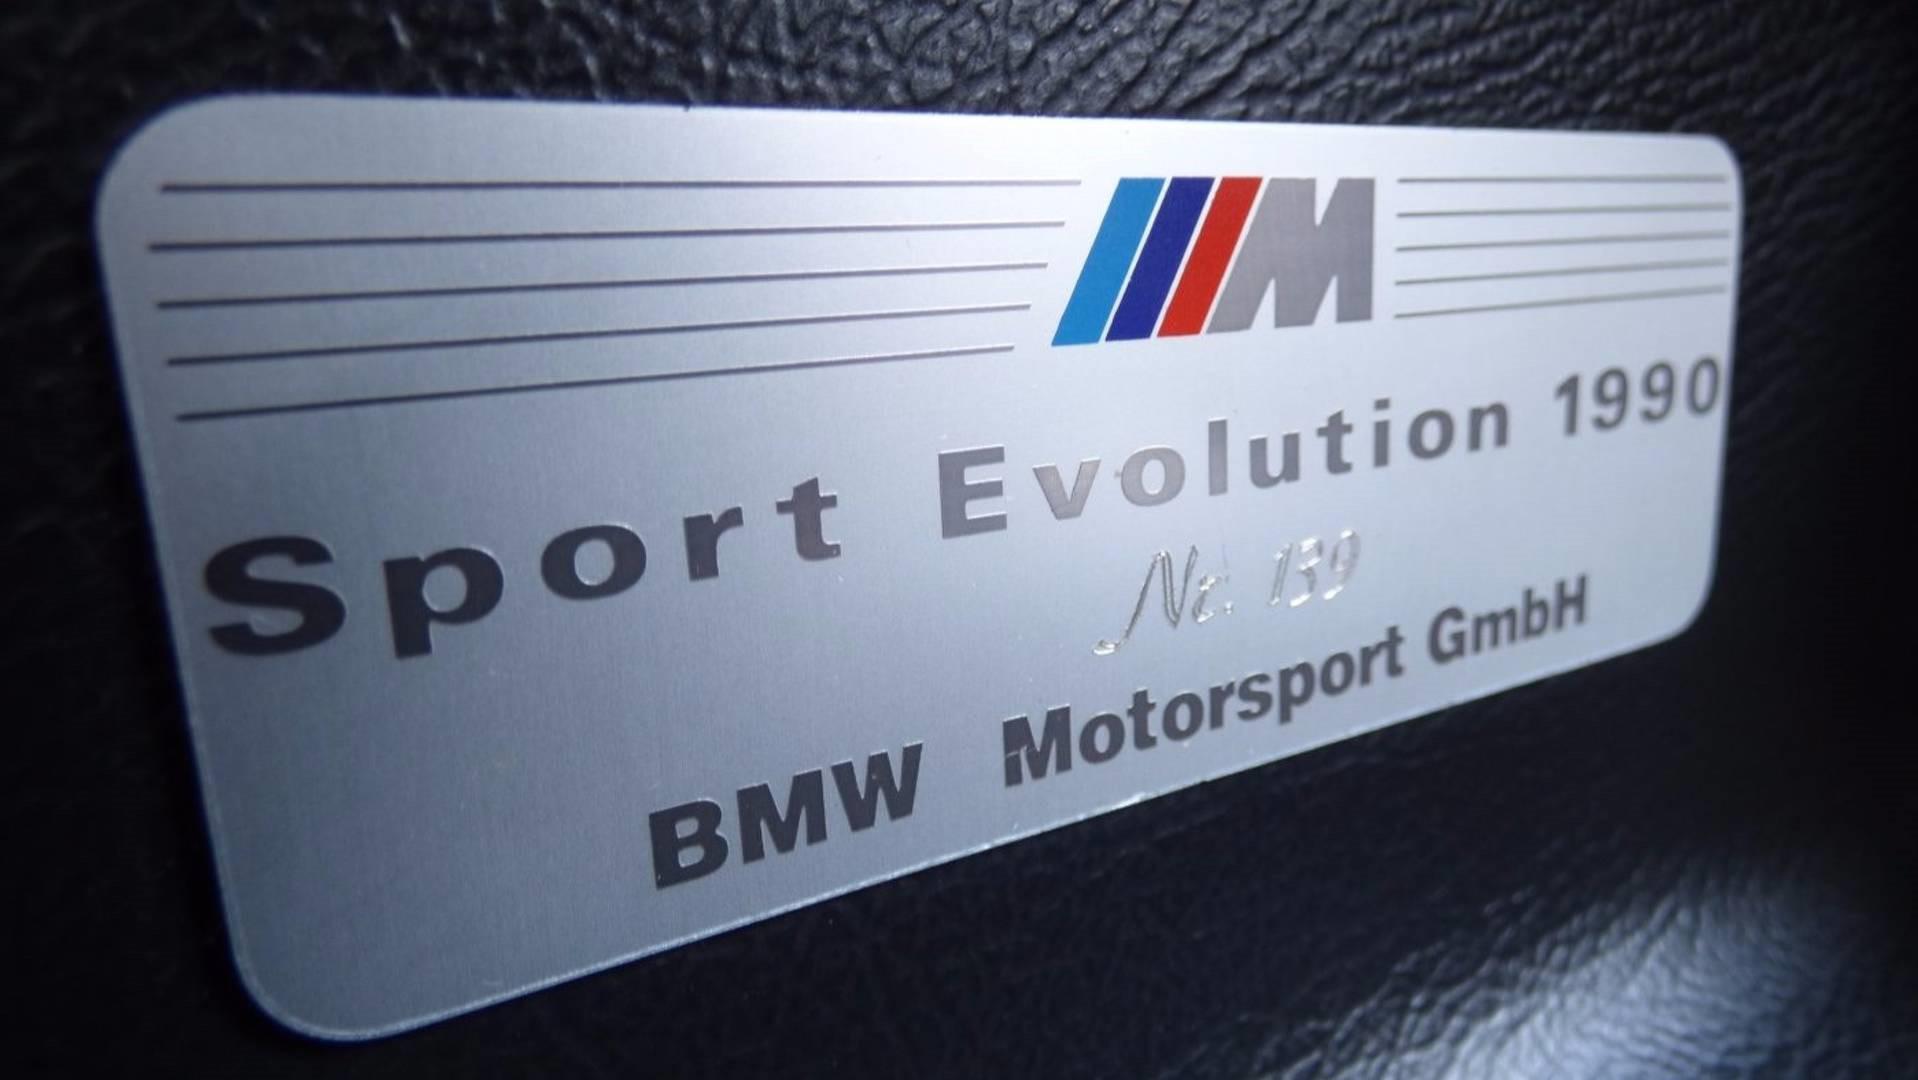 bmw-m3-e30-sport-evolution-iii-le-symbole-d-une-epoque-475-2.jpg